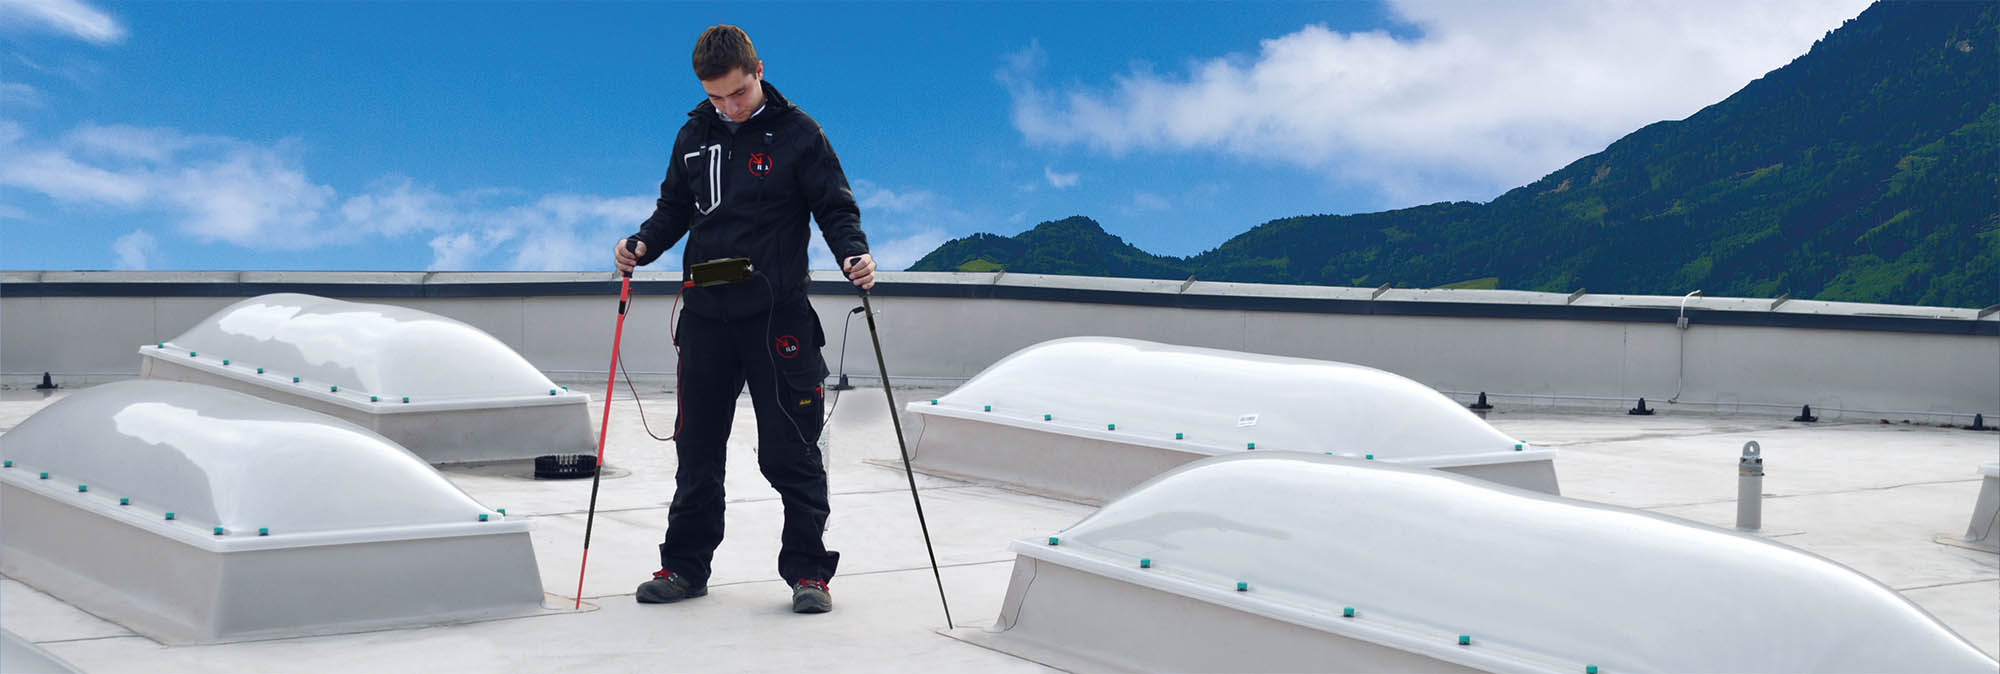 Izvedba pohodne ravne strehe